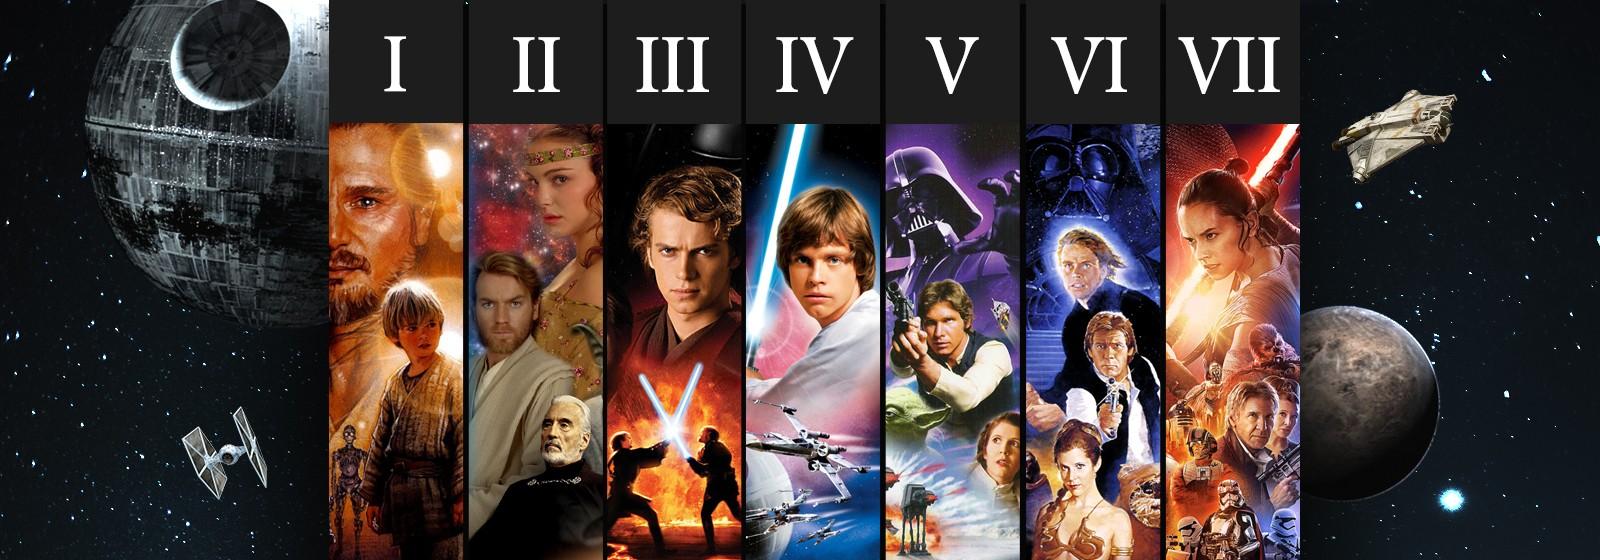 Saga Star Wars Completa